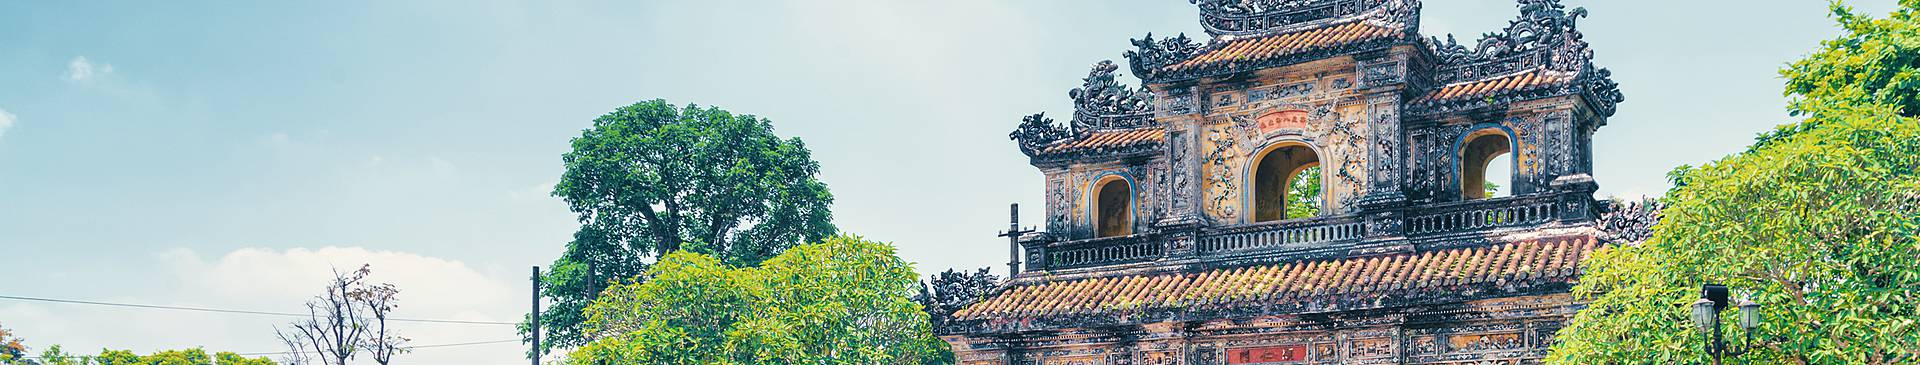 Vietnam historical sites